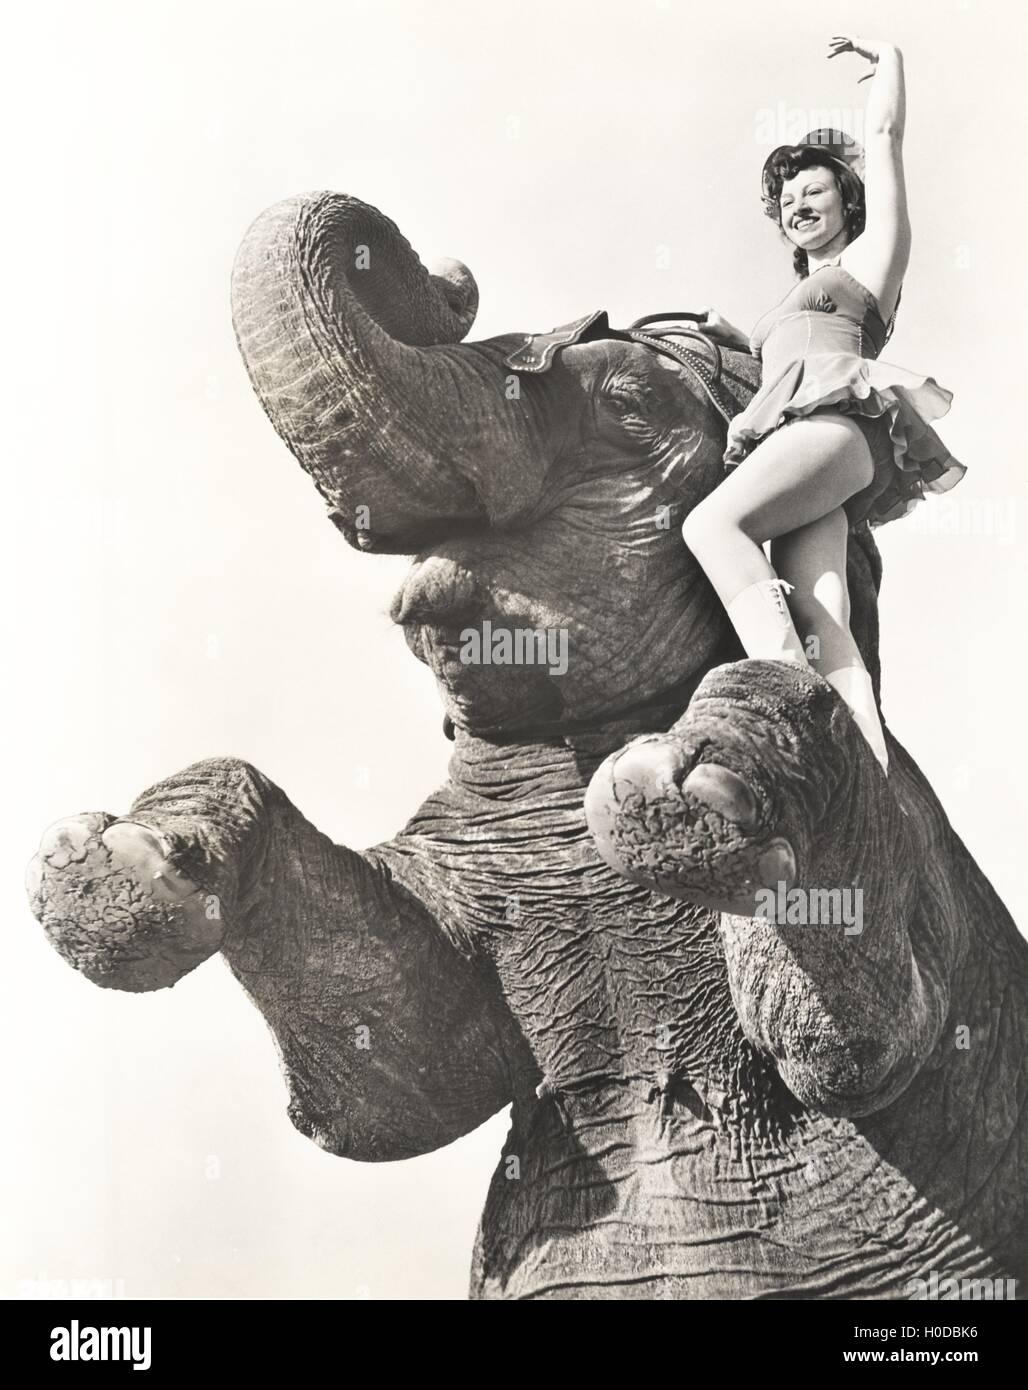 Circus performer posing on elephant - Stock Image